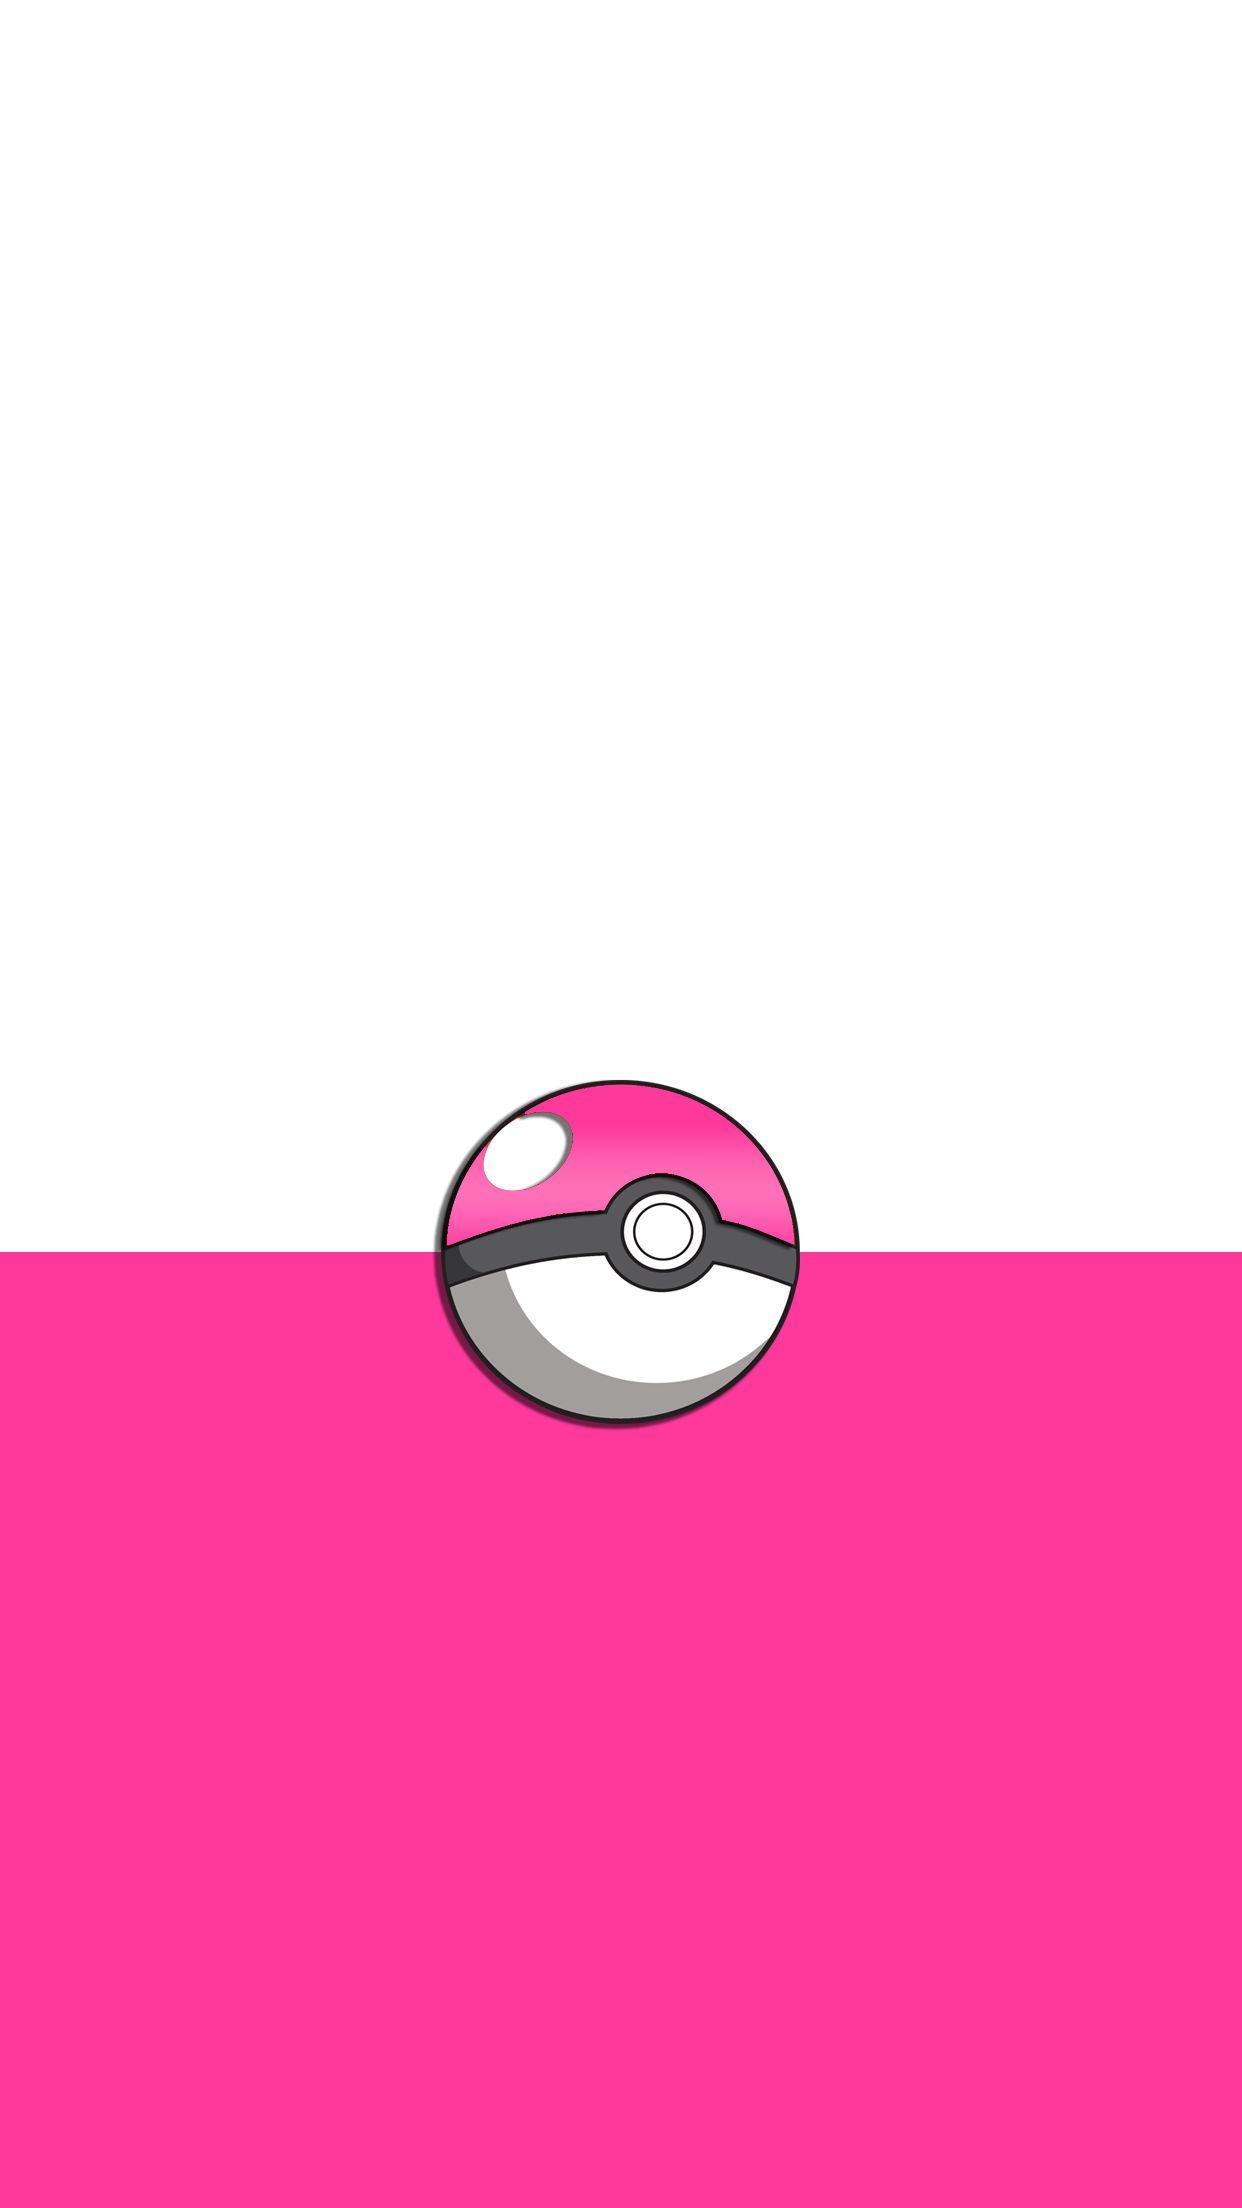 Pokemon pokemon go pink wallpaper hd cute background iphone pokemon pokemon go pink wallpaper hd cute background iphone voltagebd Images